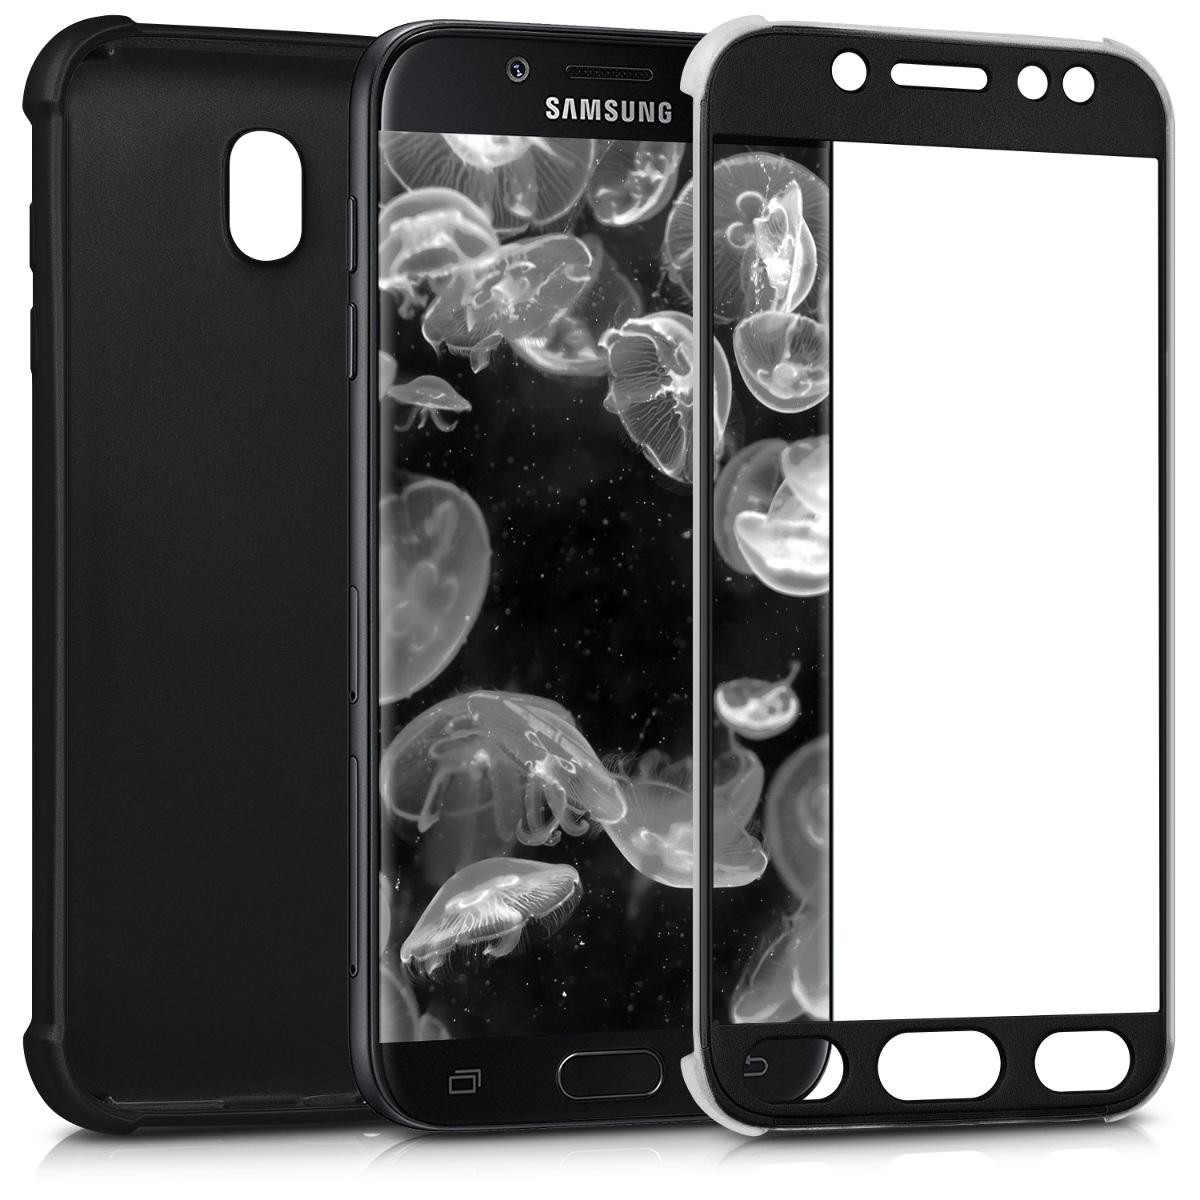 KW Θήκη Σιλικόνης Full Body Samsung Galaxy J7 (2017) DUOS - Metallic Black (42758.68)